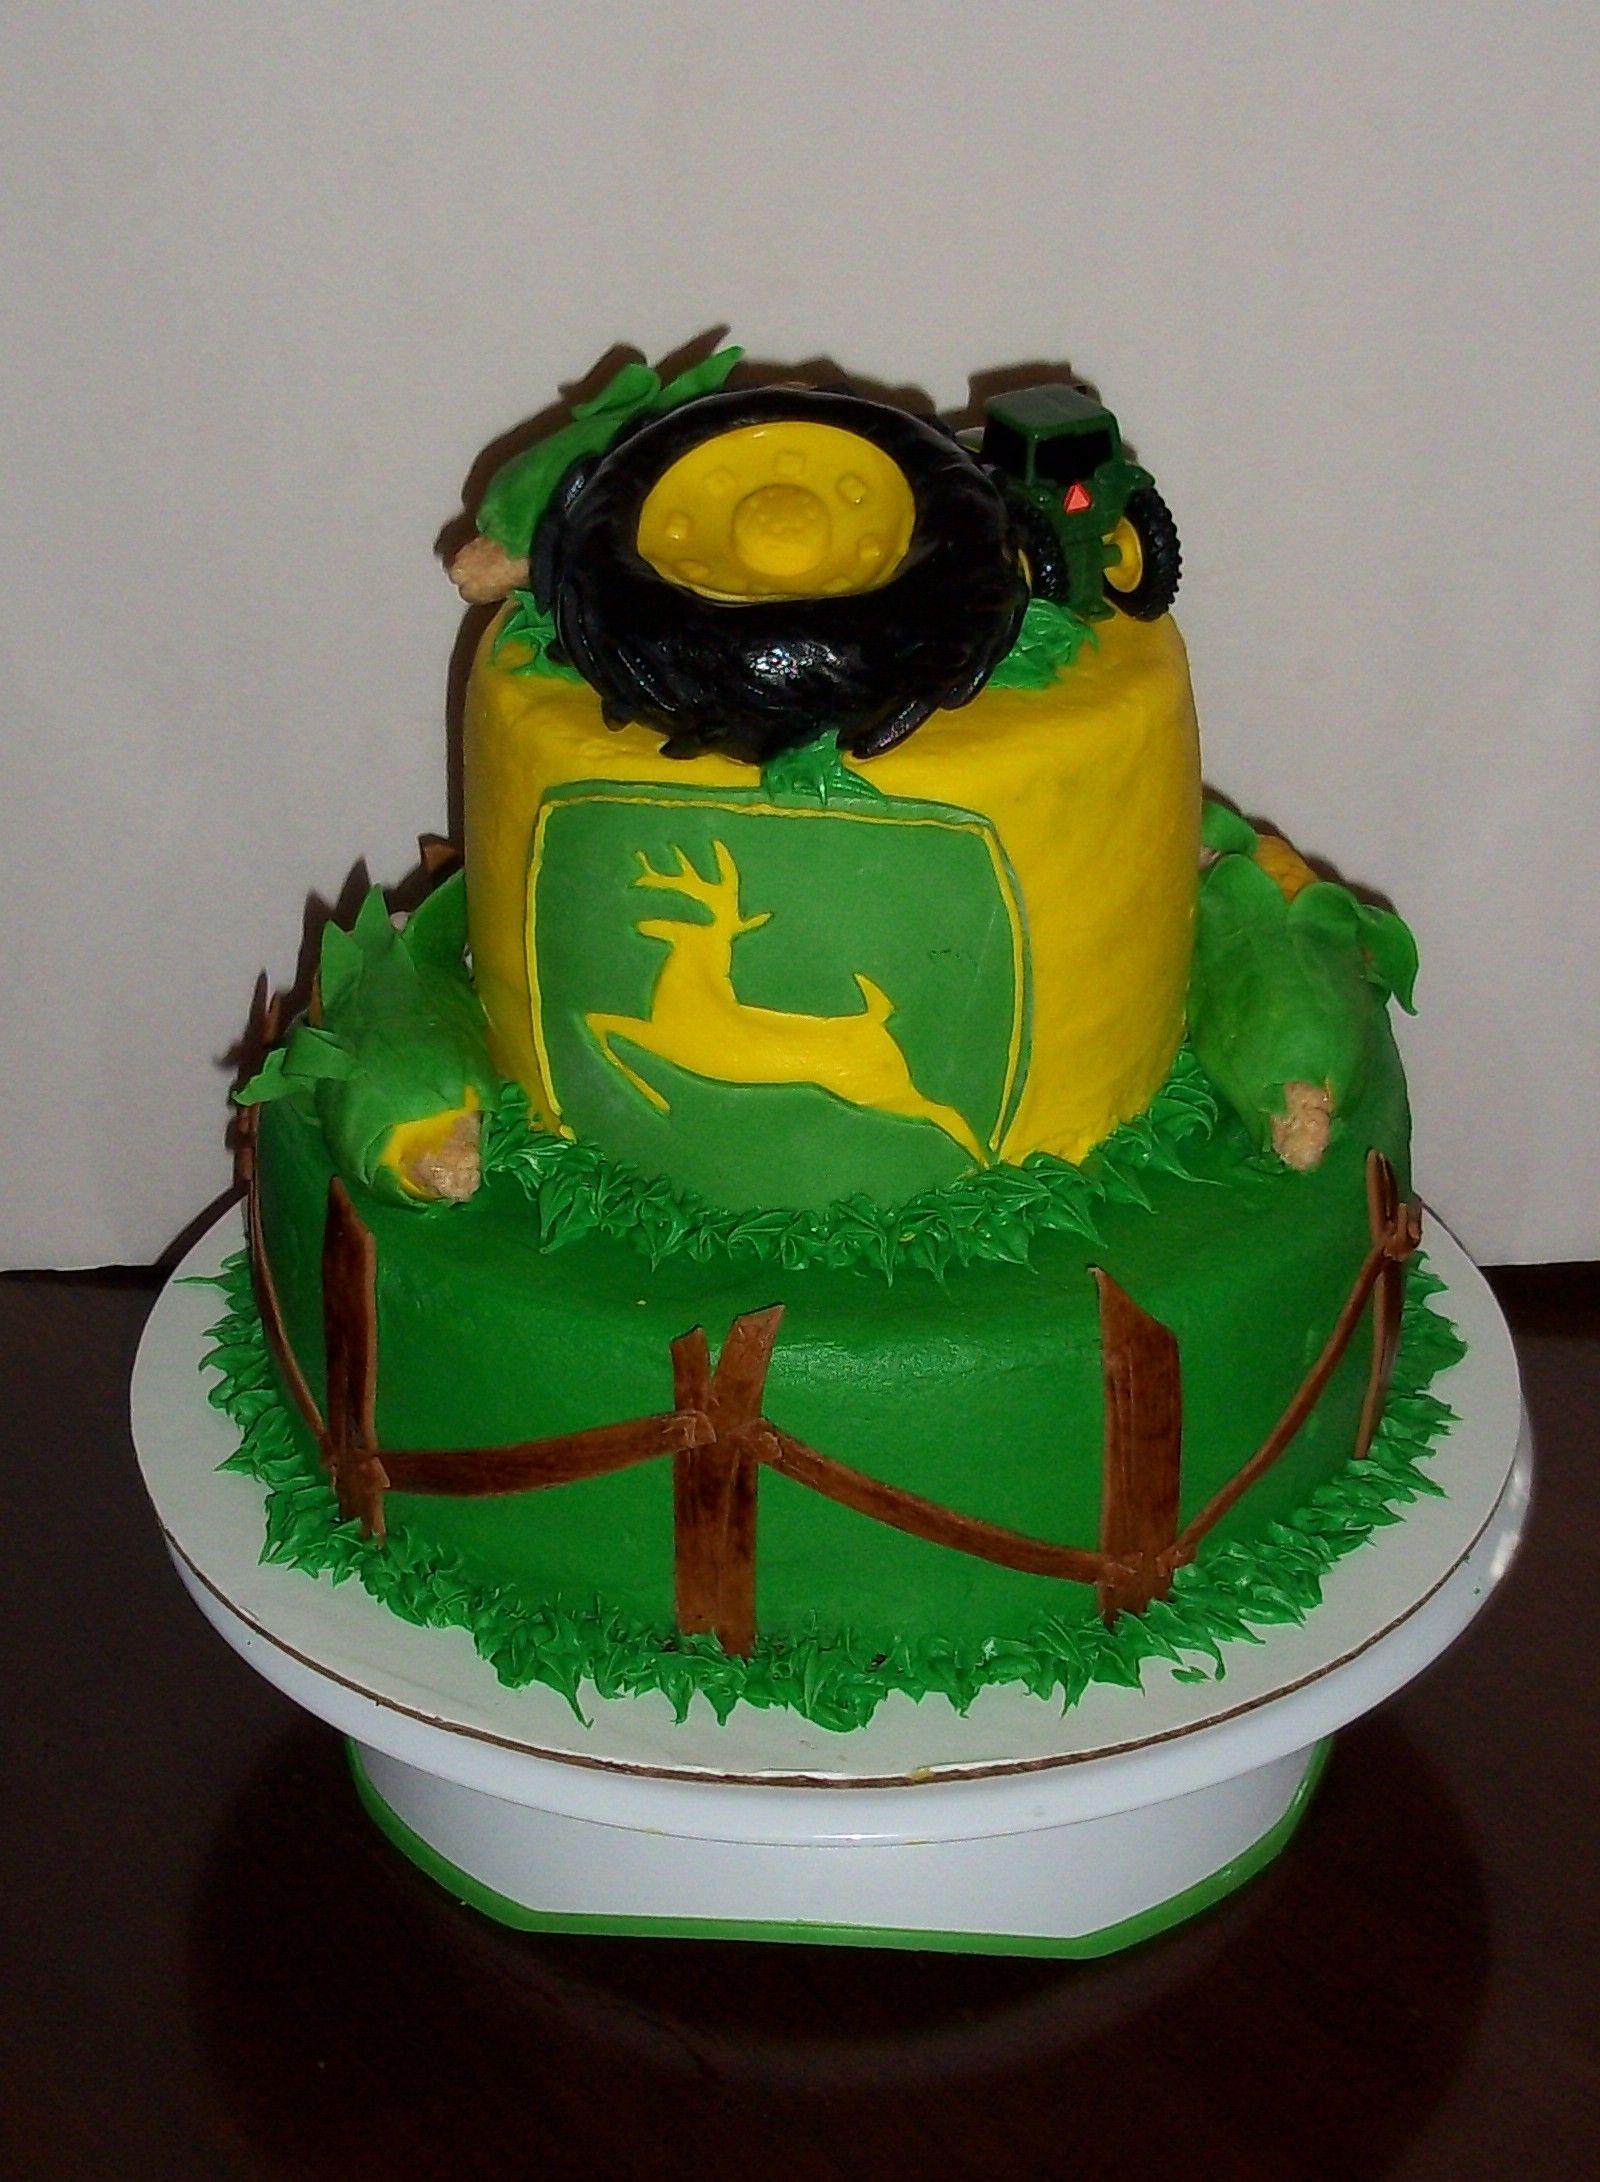 2 Tier John Deere Birthday Cake